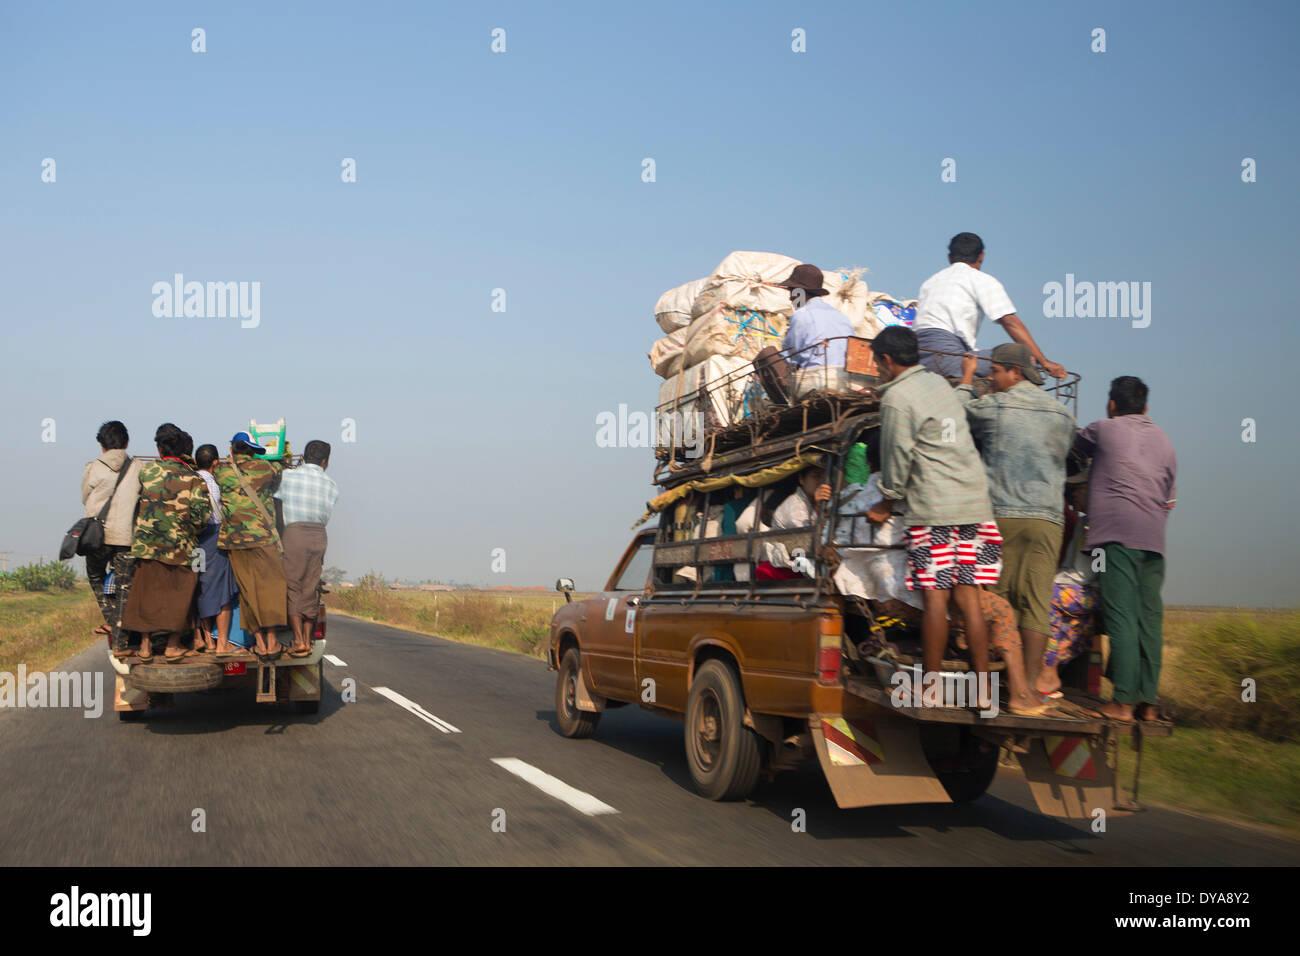 Local transport, Mon, Myanmar, Burma, Asia, dangerous, people, traffic, truck, overloaded - Stock Image